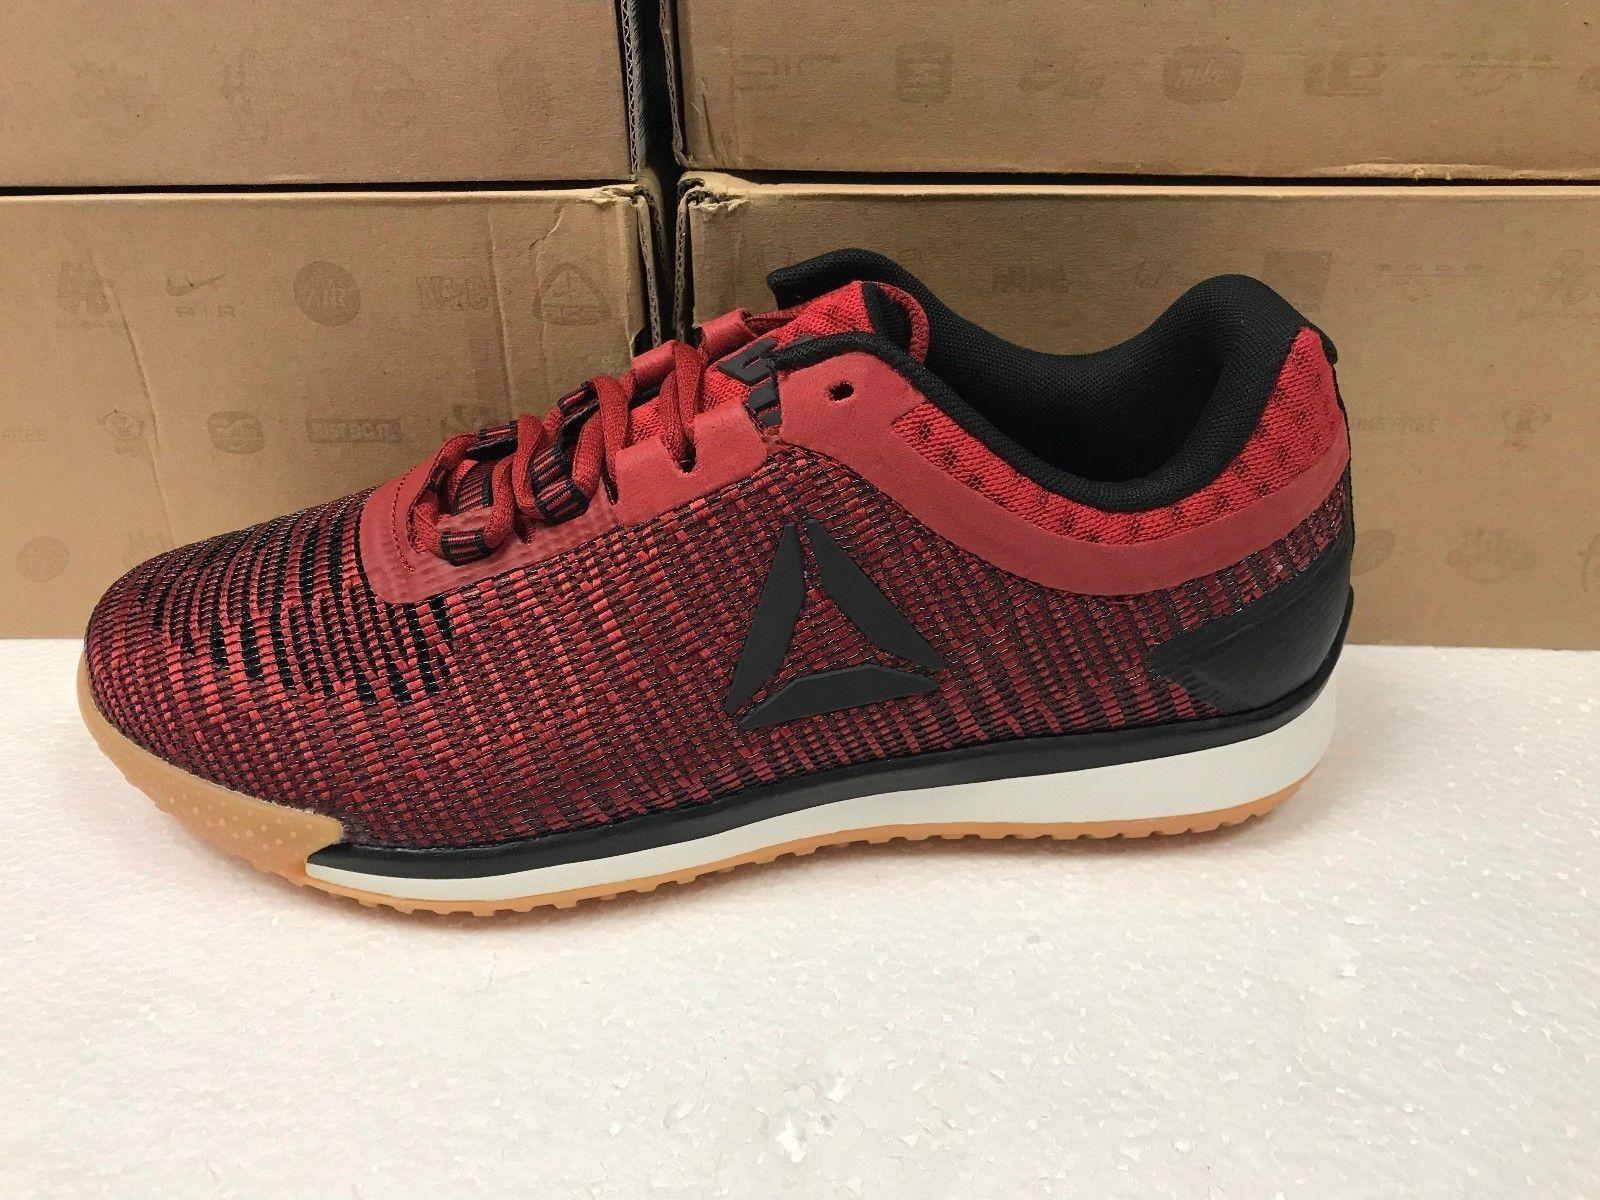 Мужская спортивная обувь NEW MENS REEBOK JJ II LOW JJ WATT SNEAKERS CN0985- SHOES-MULTIPLE SIZES c6edcd41d